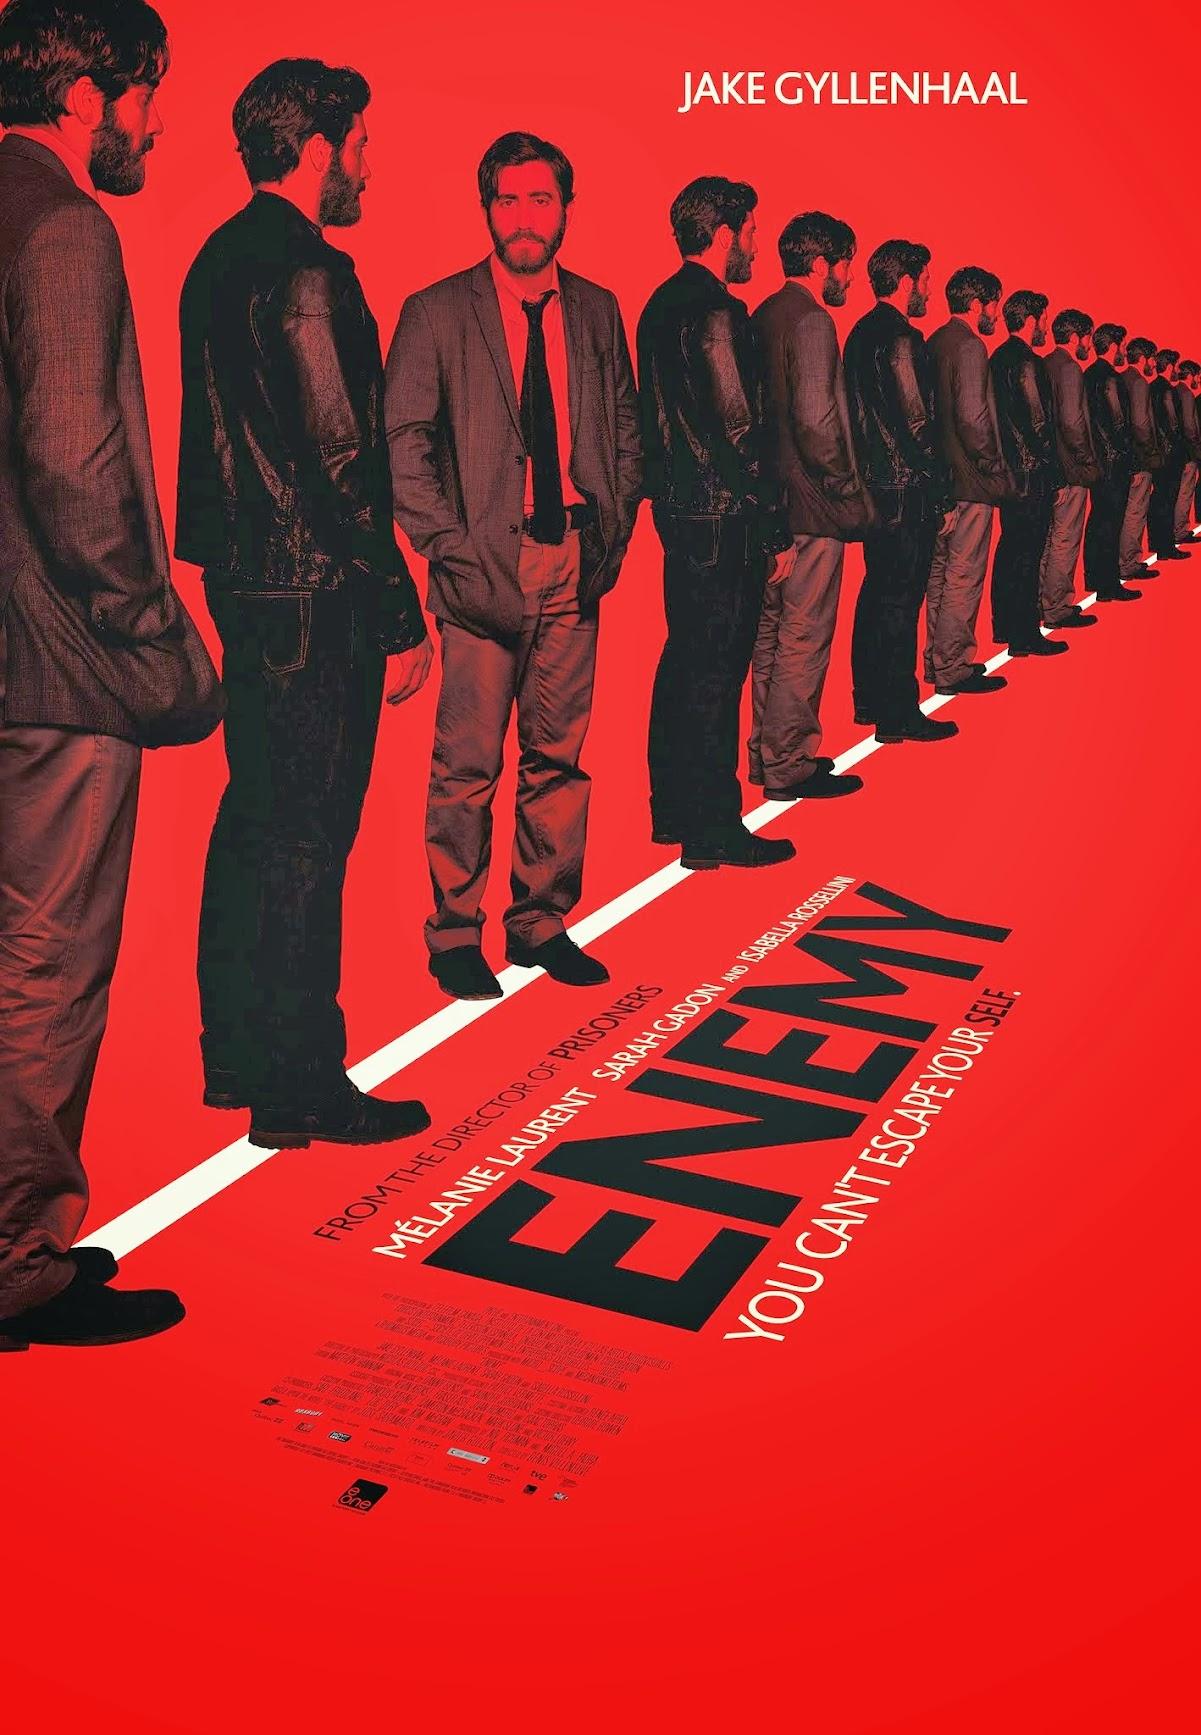 http://3.bp.blogspot.com/-agxFyd5y5QA/Us325mRJg0I/AAAAAAAATKw/uvJOgl0v1nU/s1735/Enemy_New_Oficial_Poster_JPosters.jpg